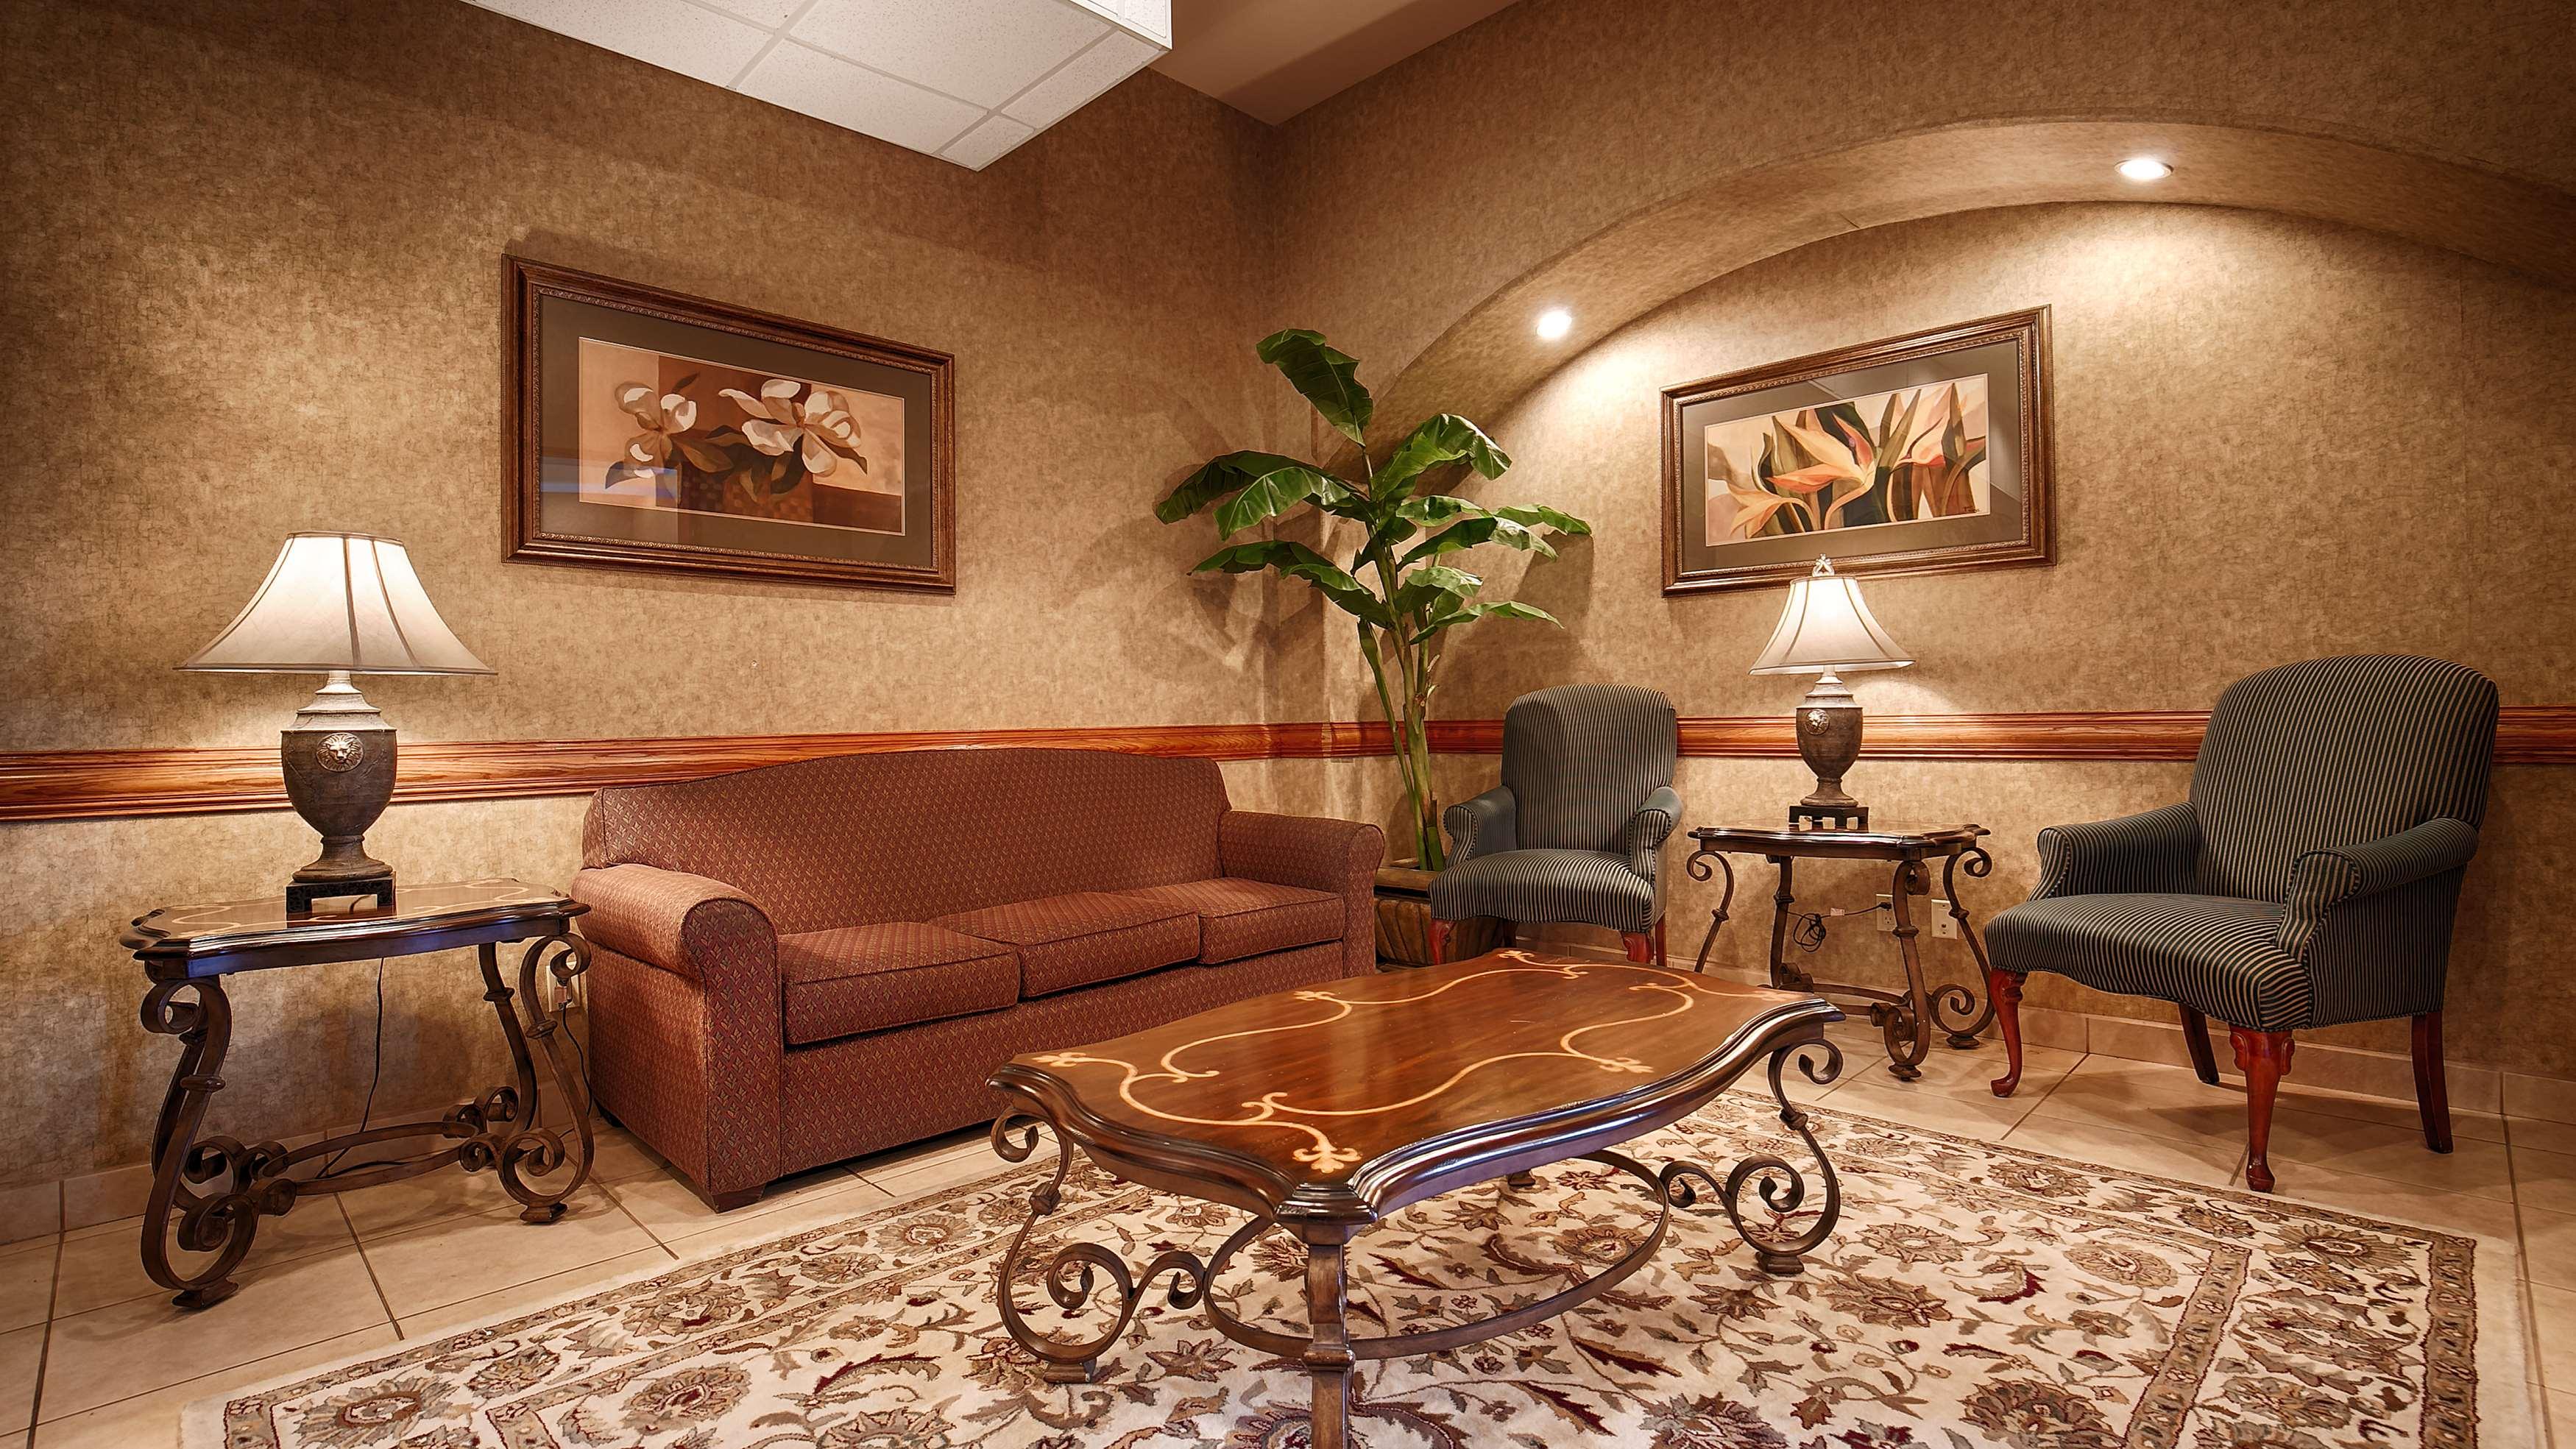 Best Western Casa Villa Suites image 27